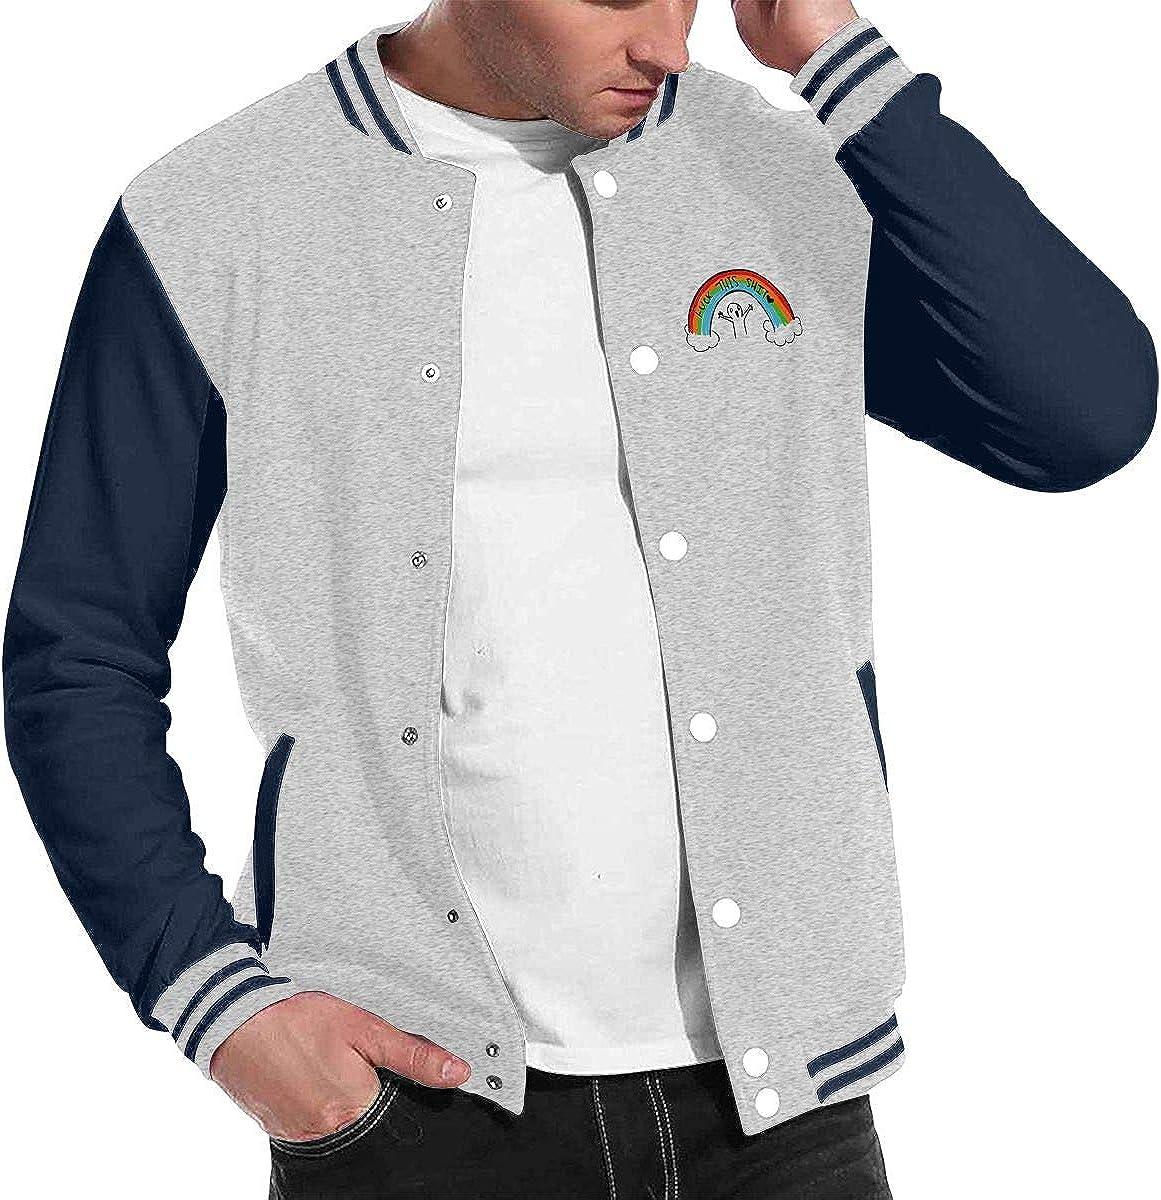 JJKKFG-H Fuck This Shit Men's Detroit Mall Uniform Baseball Jacket Fashion Sp Super intense SALE